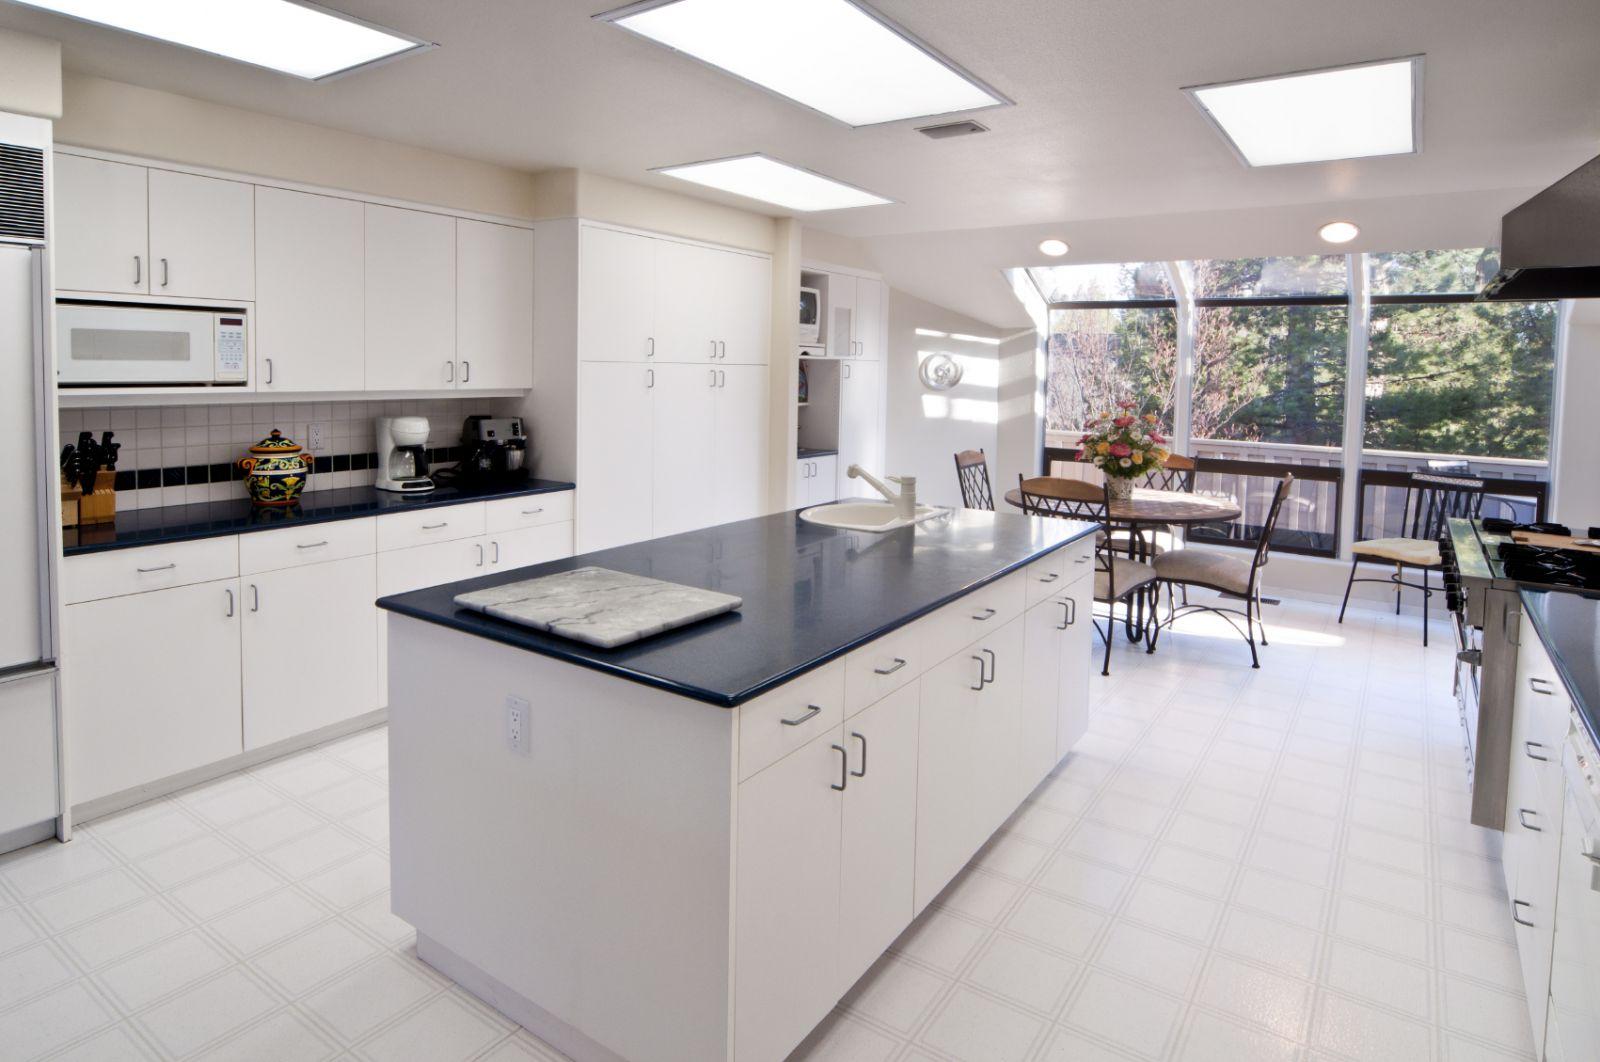 Cuatro consejos para iluminar tu cocina con Led